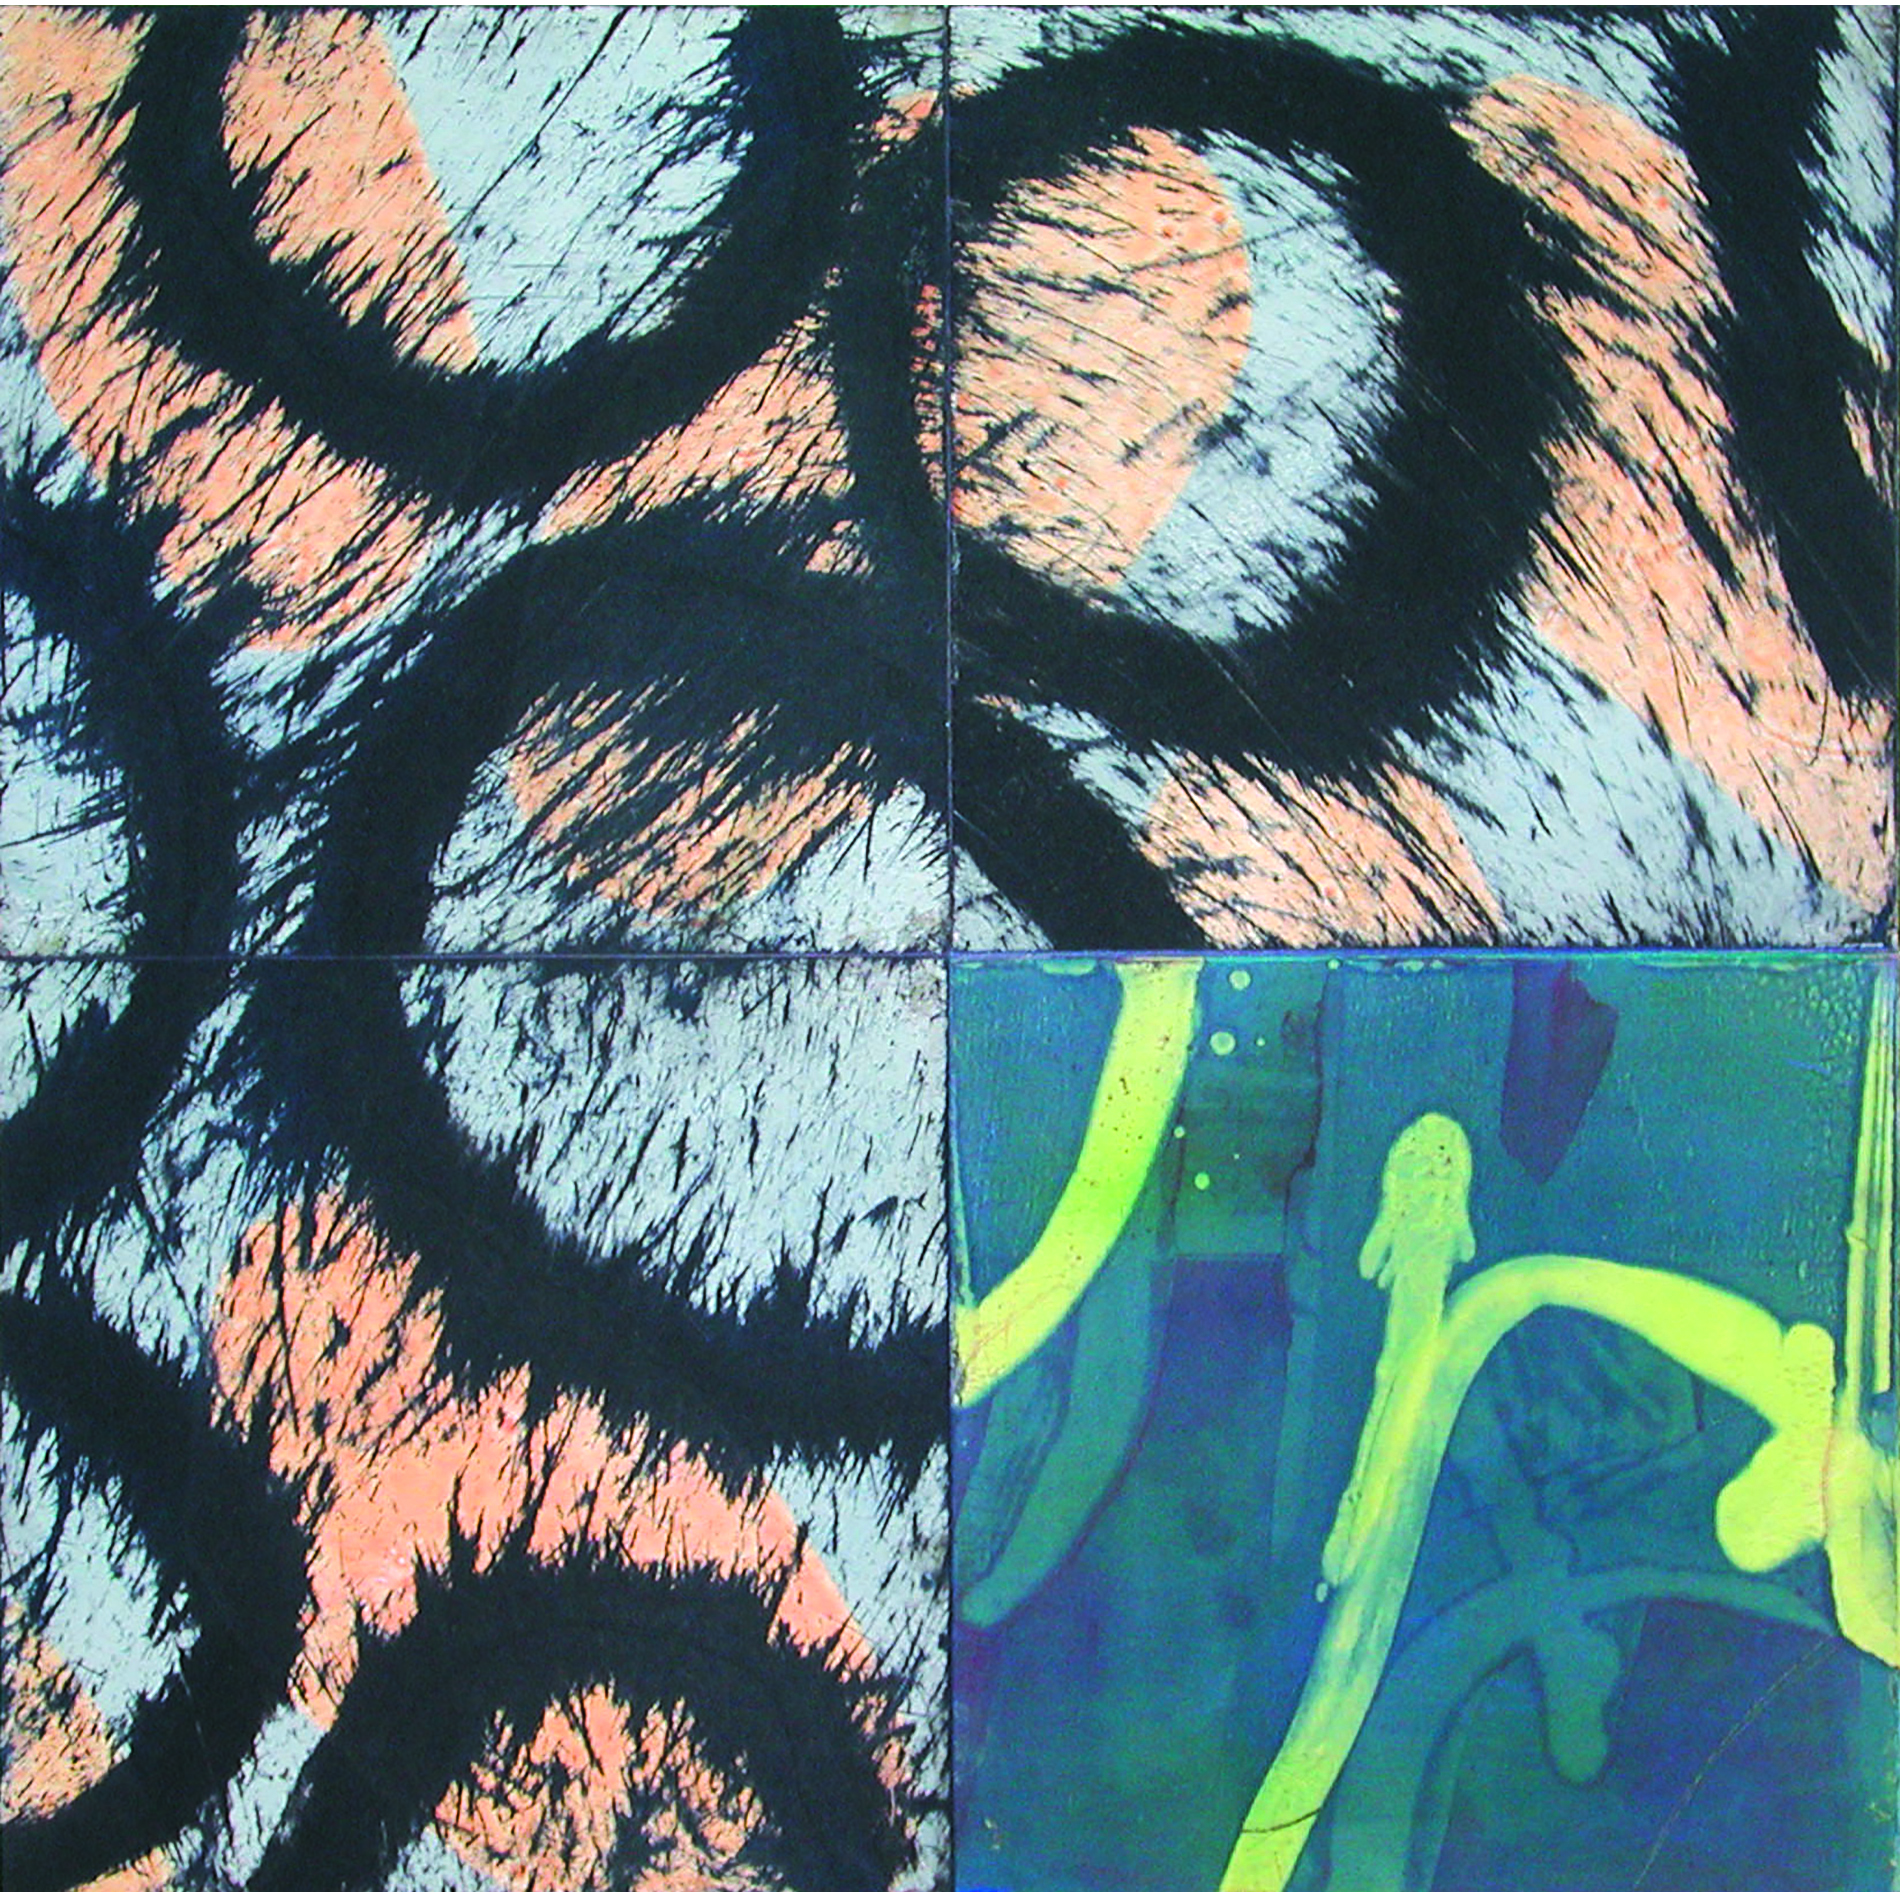 ACANTHUS QUATTRO XXIX 2003 Monoprint Image size 24 x 24 inches Paper size 32 x 32 inches